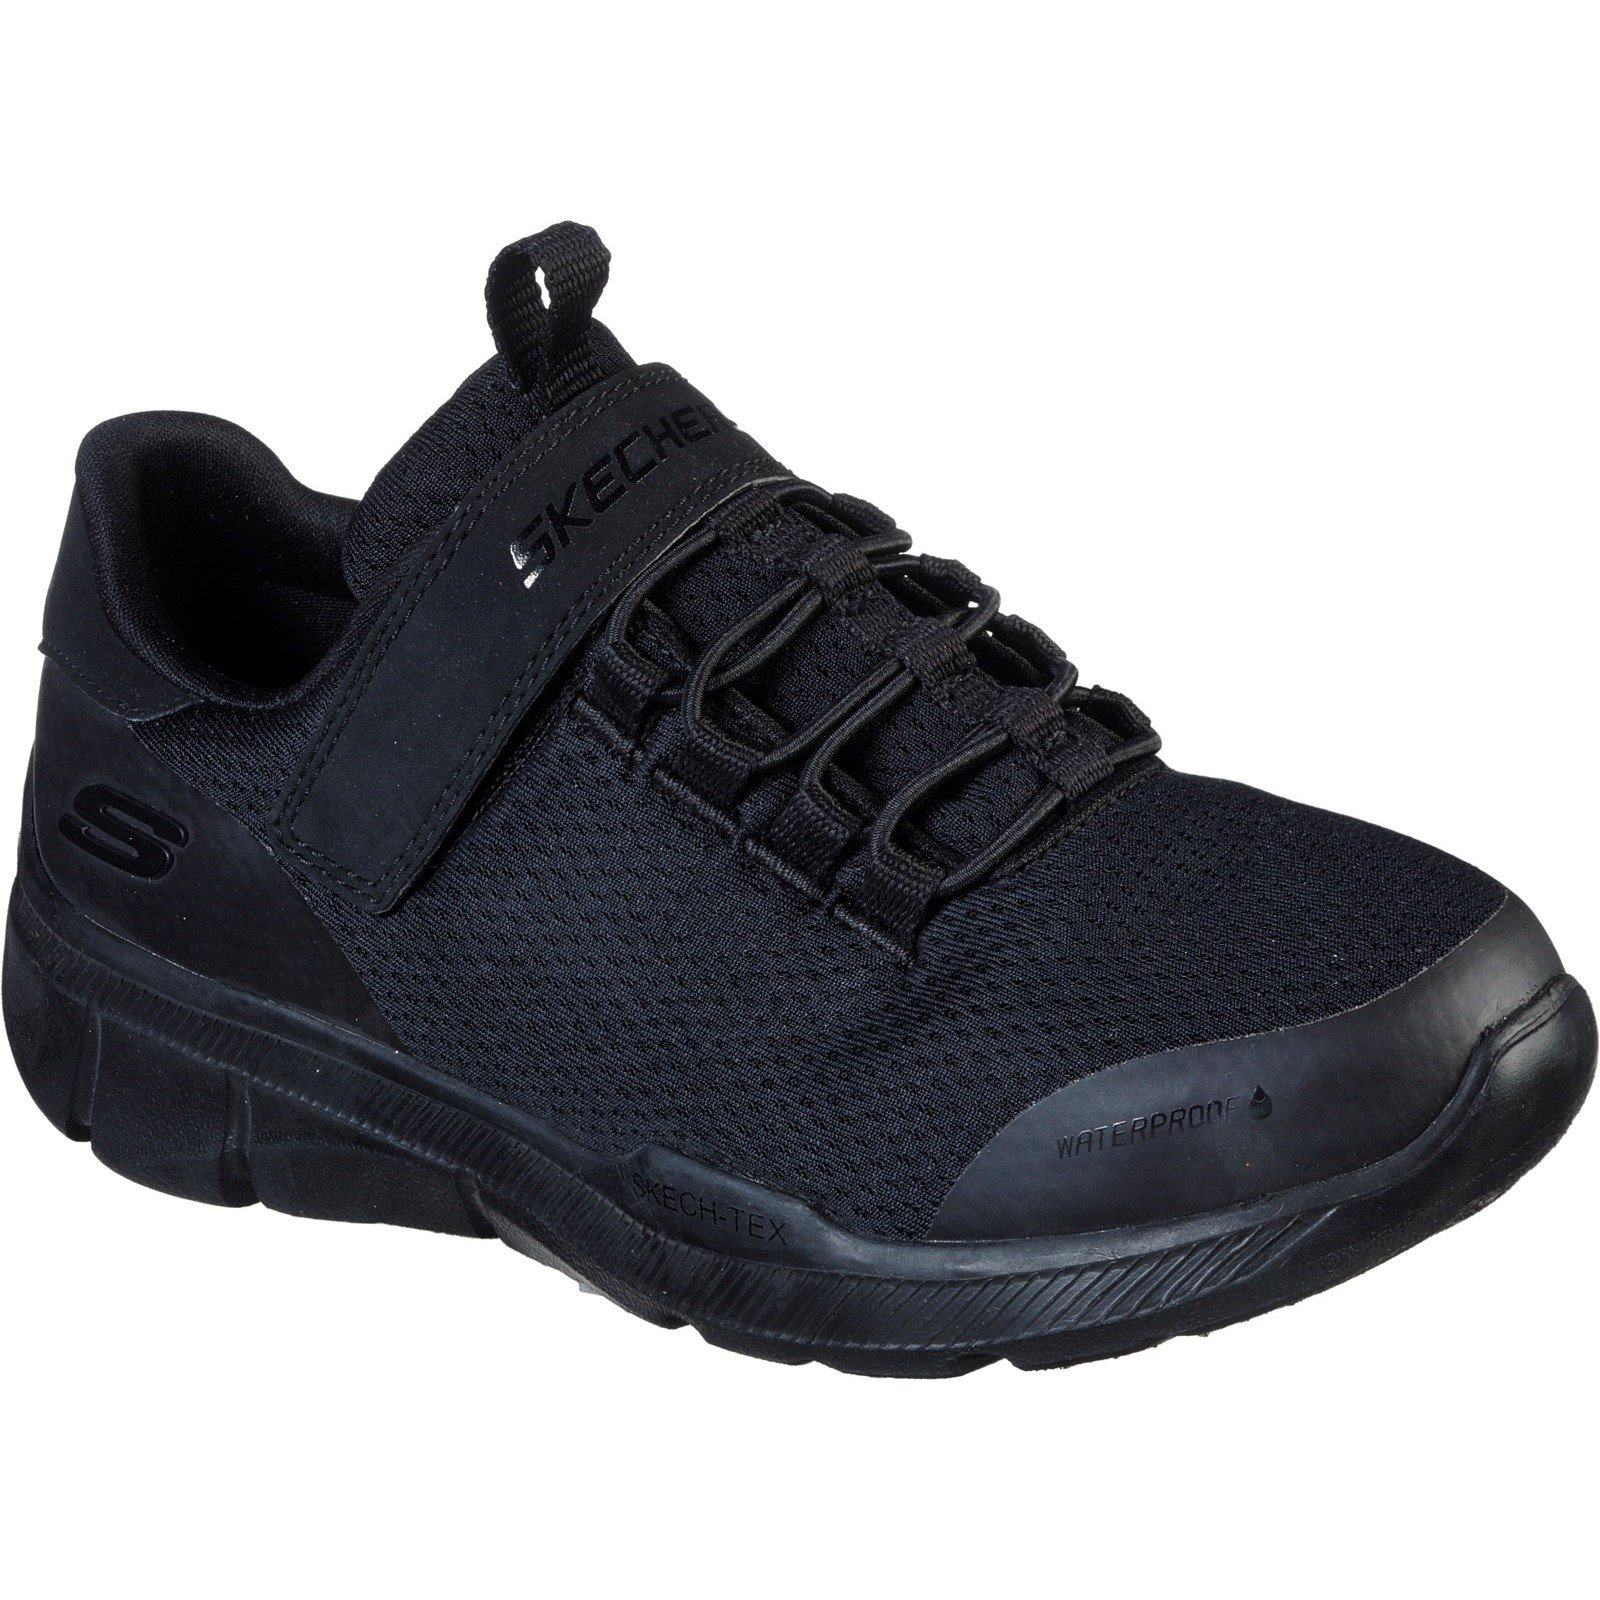 Skechers Unisex Equalizer 3.0 Aquablast Trainer Black 28533 - Black 12